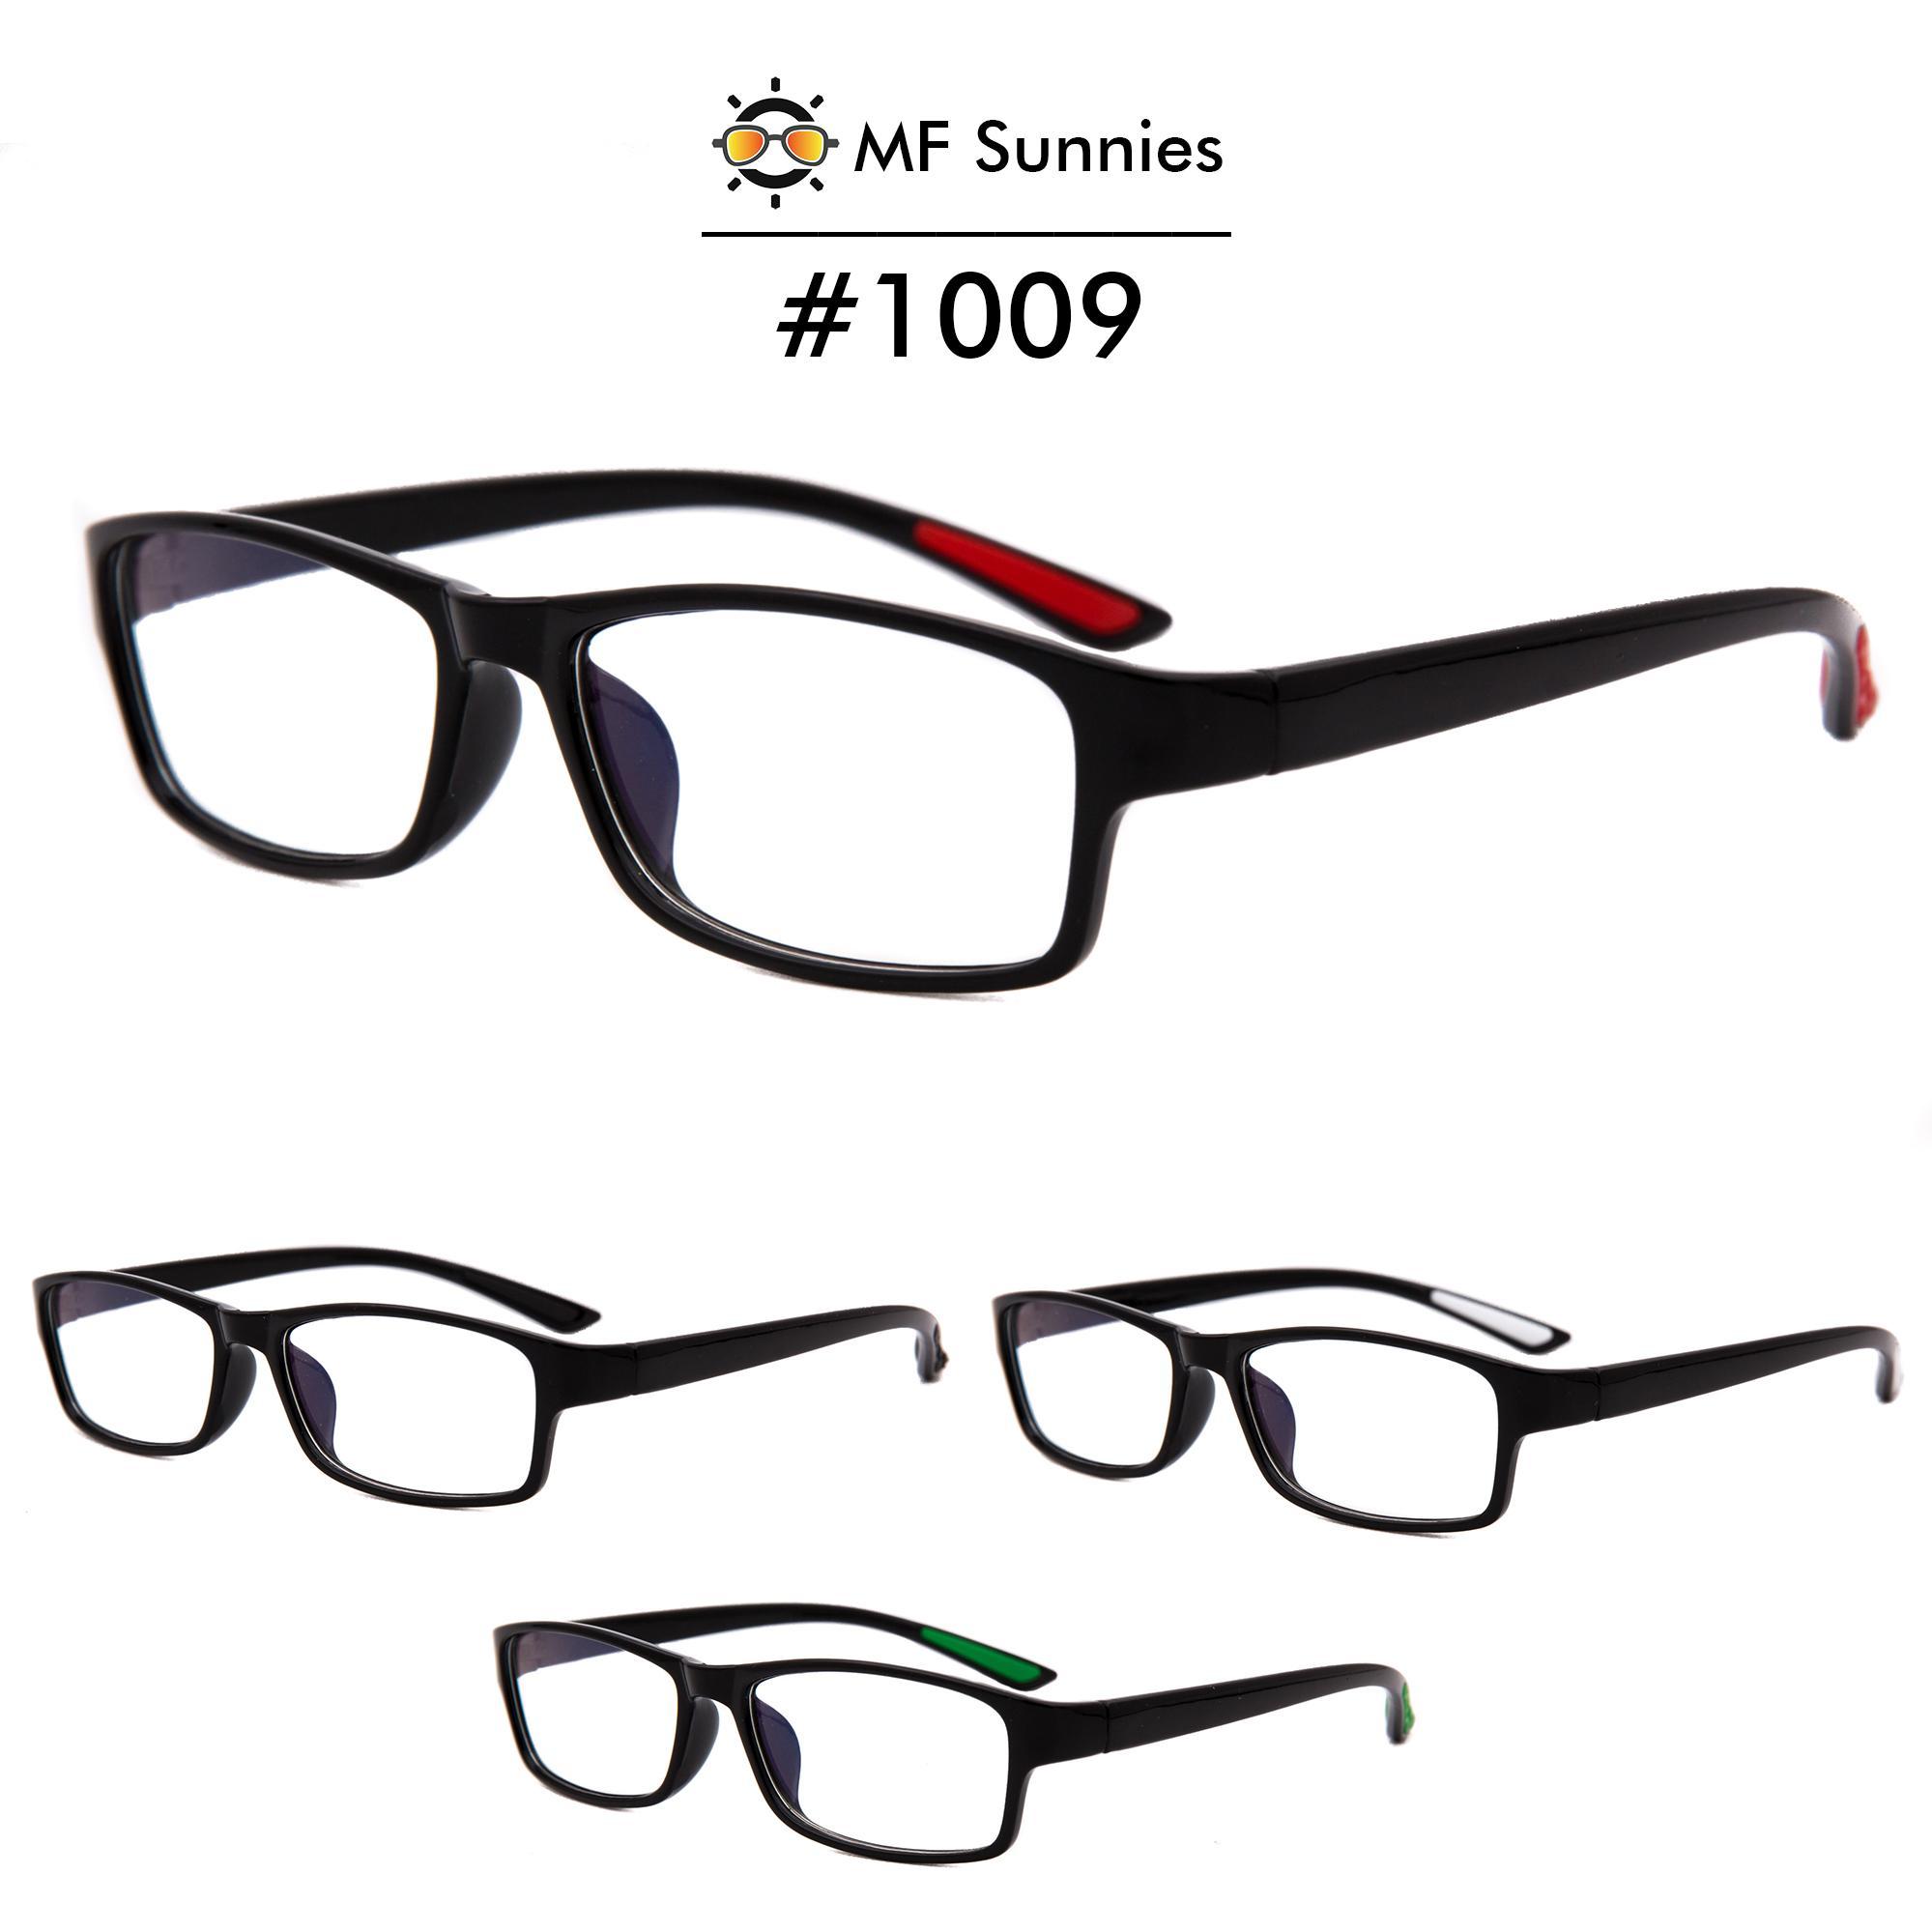 e718bb0fb00 MFSunnies Replaceable Lens Acetate Frame Fashion Eyewear Anti Radiation  Anti Blue Light  1009